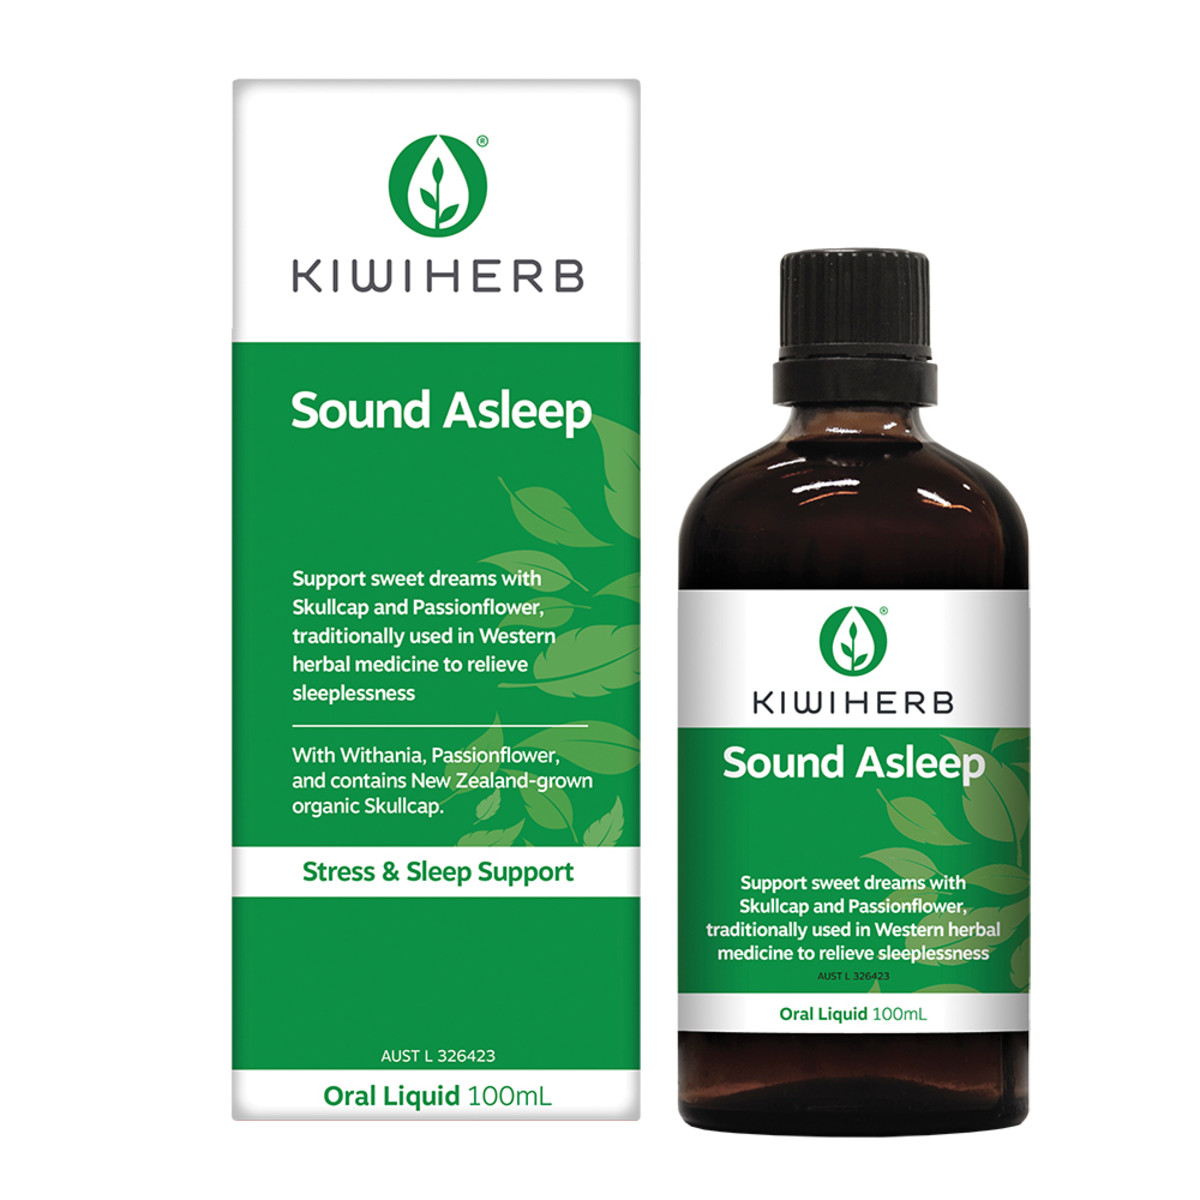 KiwiHerb Sound Asleep